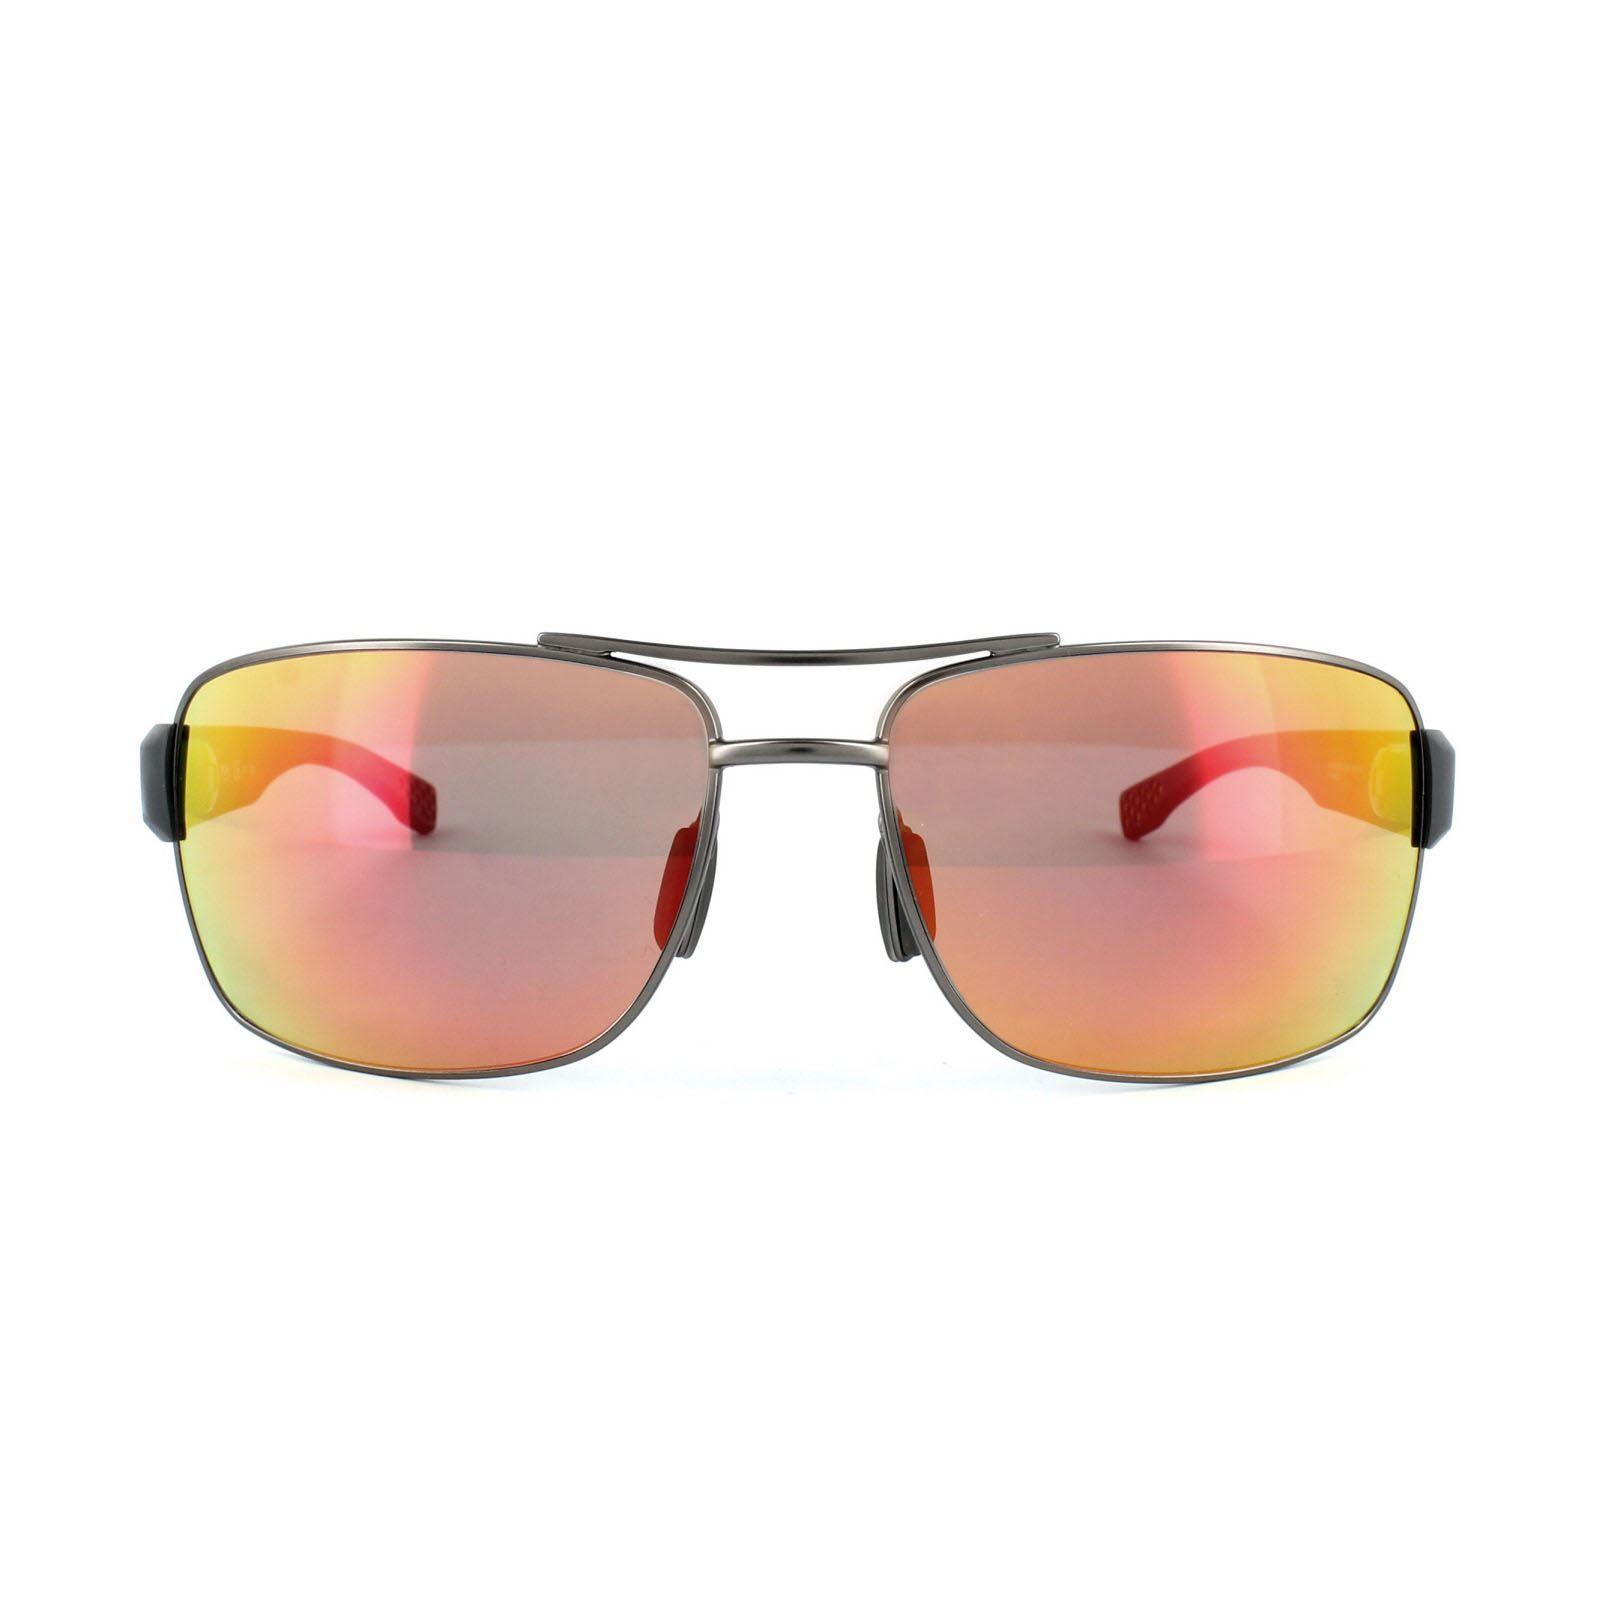 Hugo Boss Sunglasses 0801 YQD 7H Matt Dark Ruthenium Grey Red Mirror Polarized Oleophobic